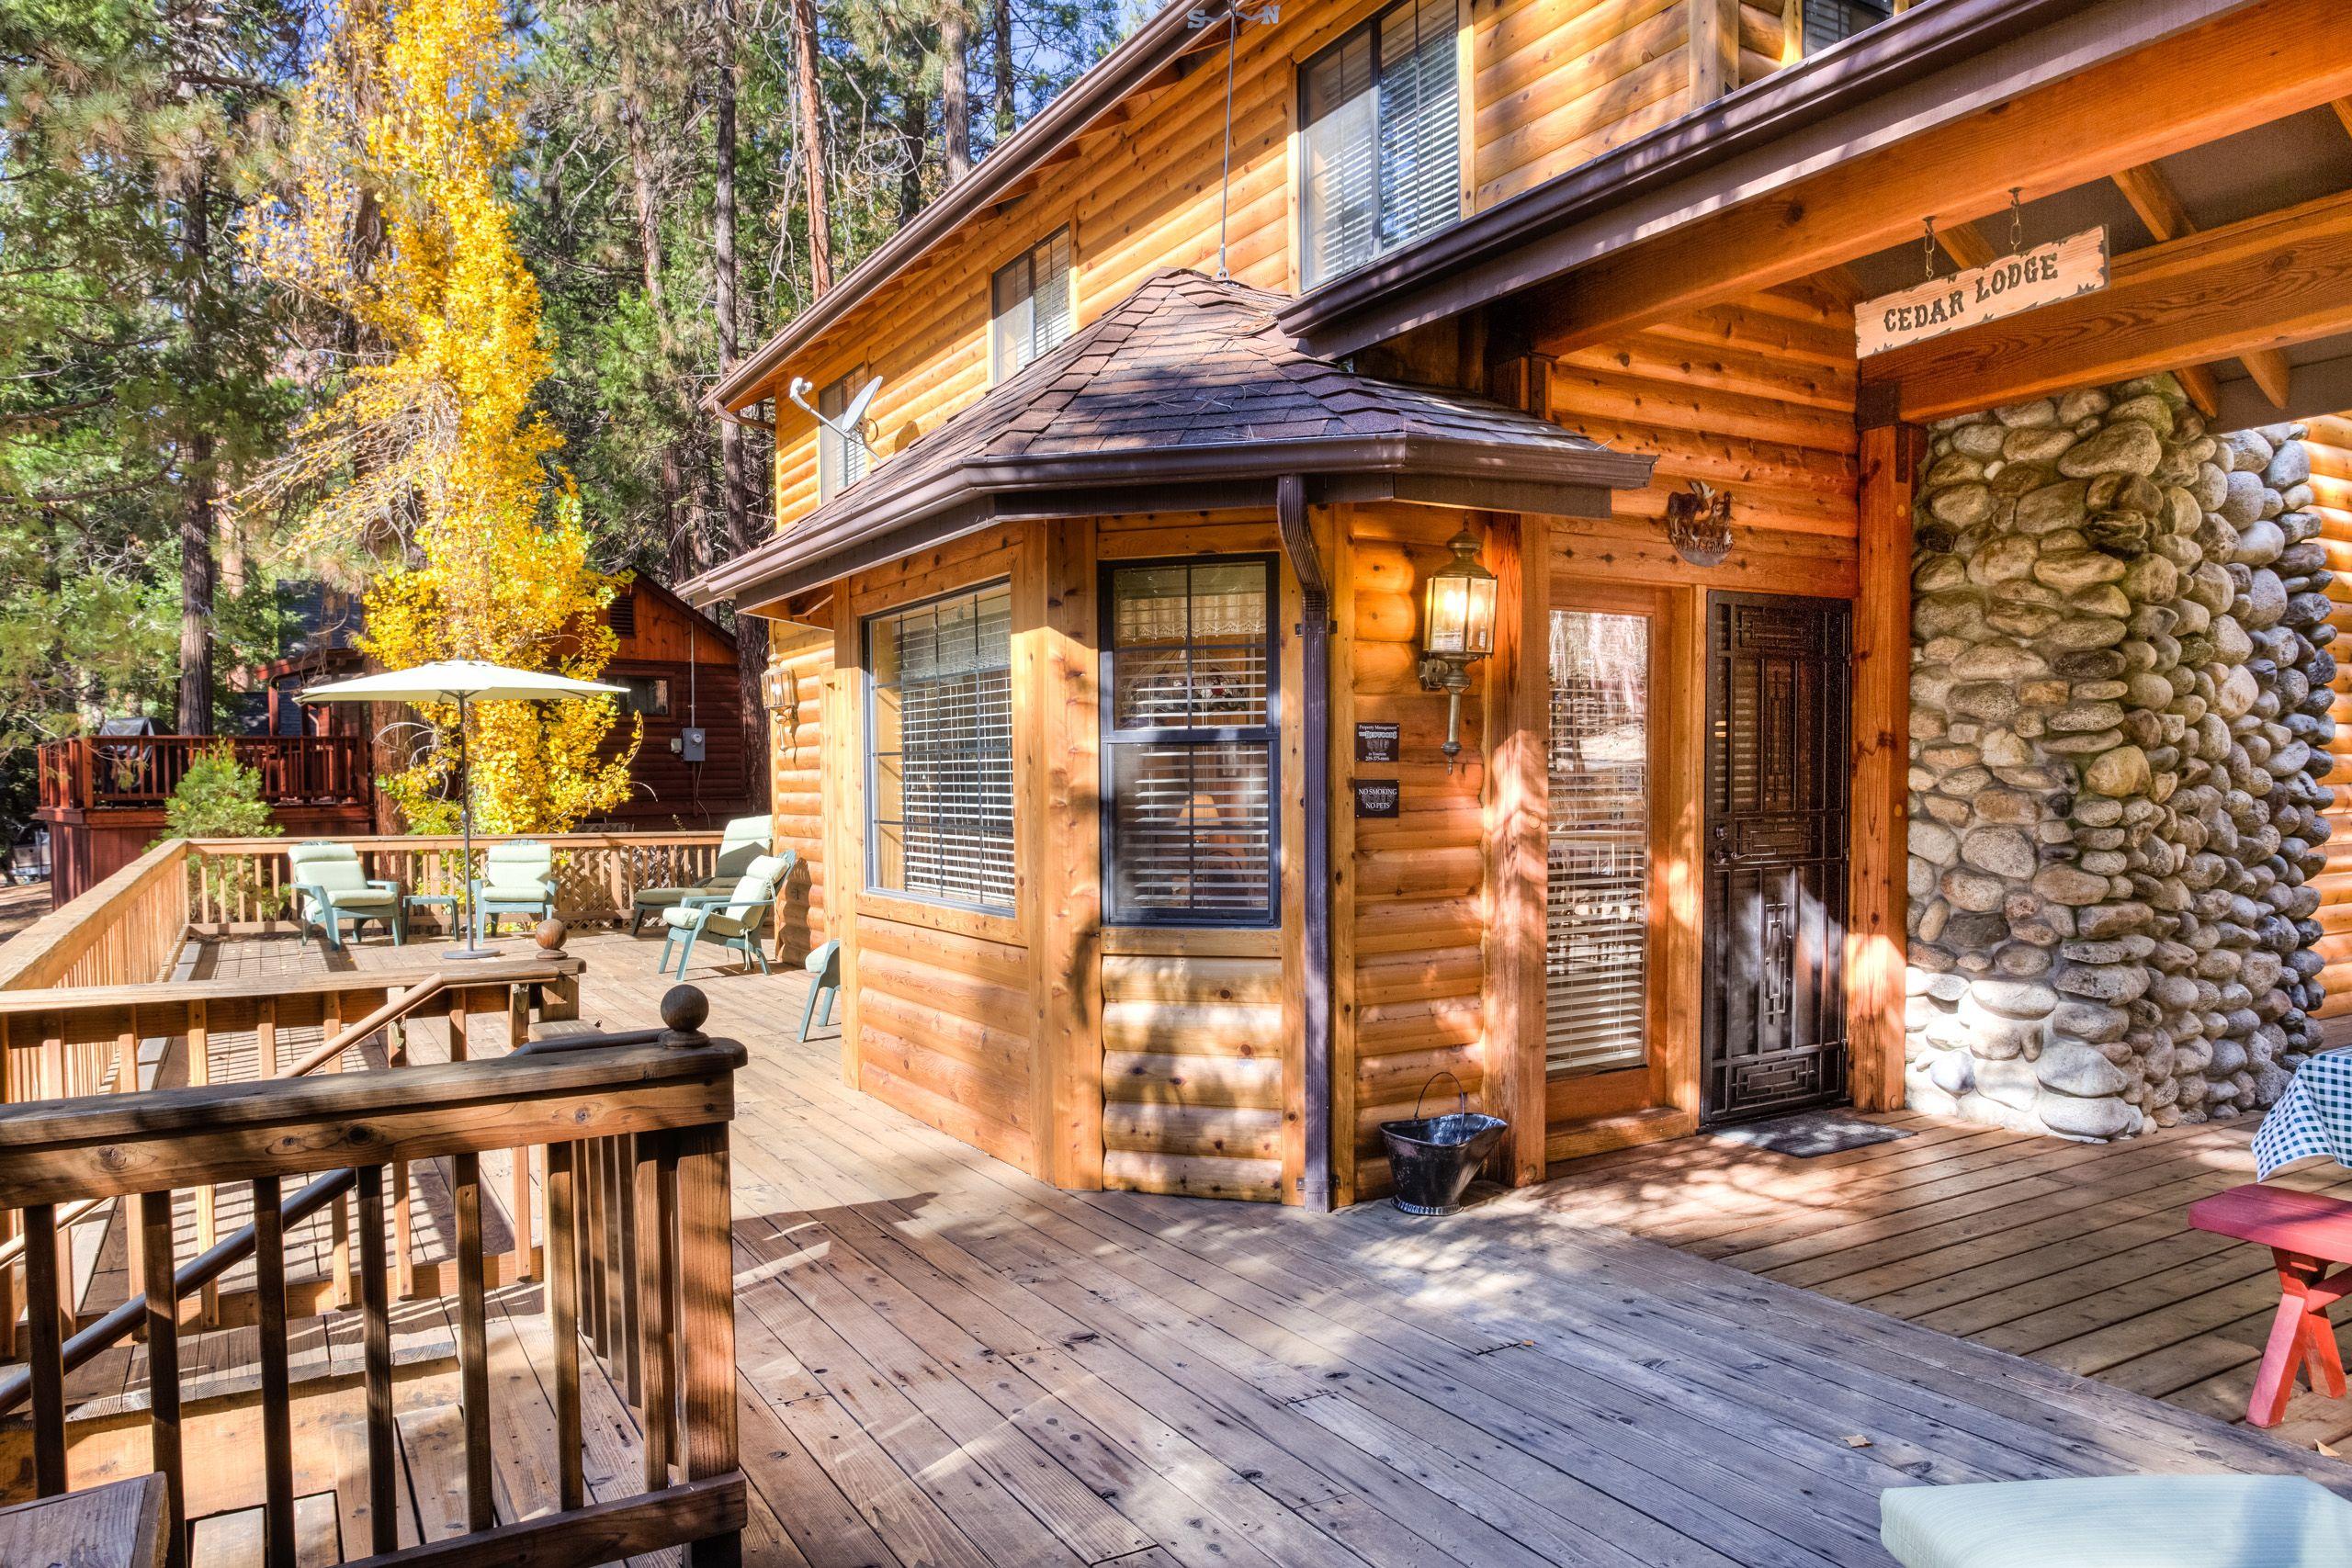 yosemite and american five top nikki sweat lodge cabin cabins near native far museum winter activities hut teepee